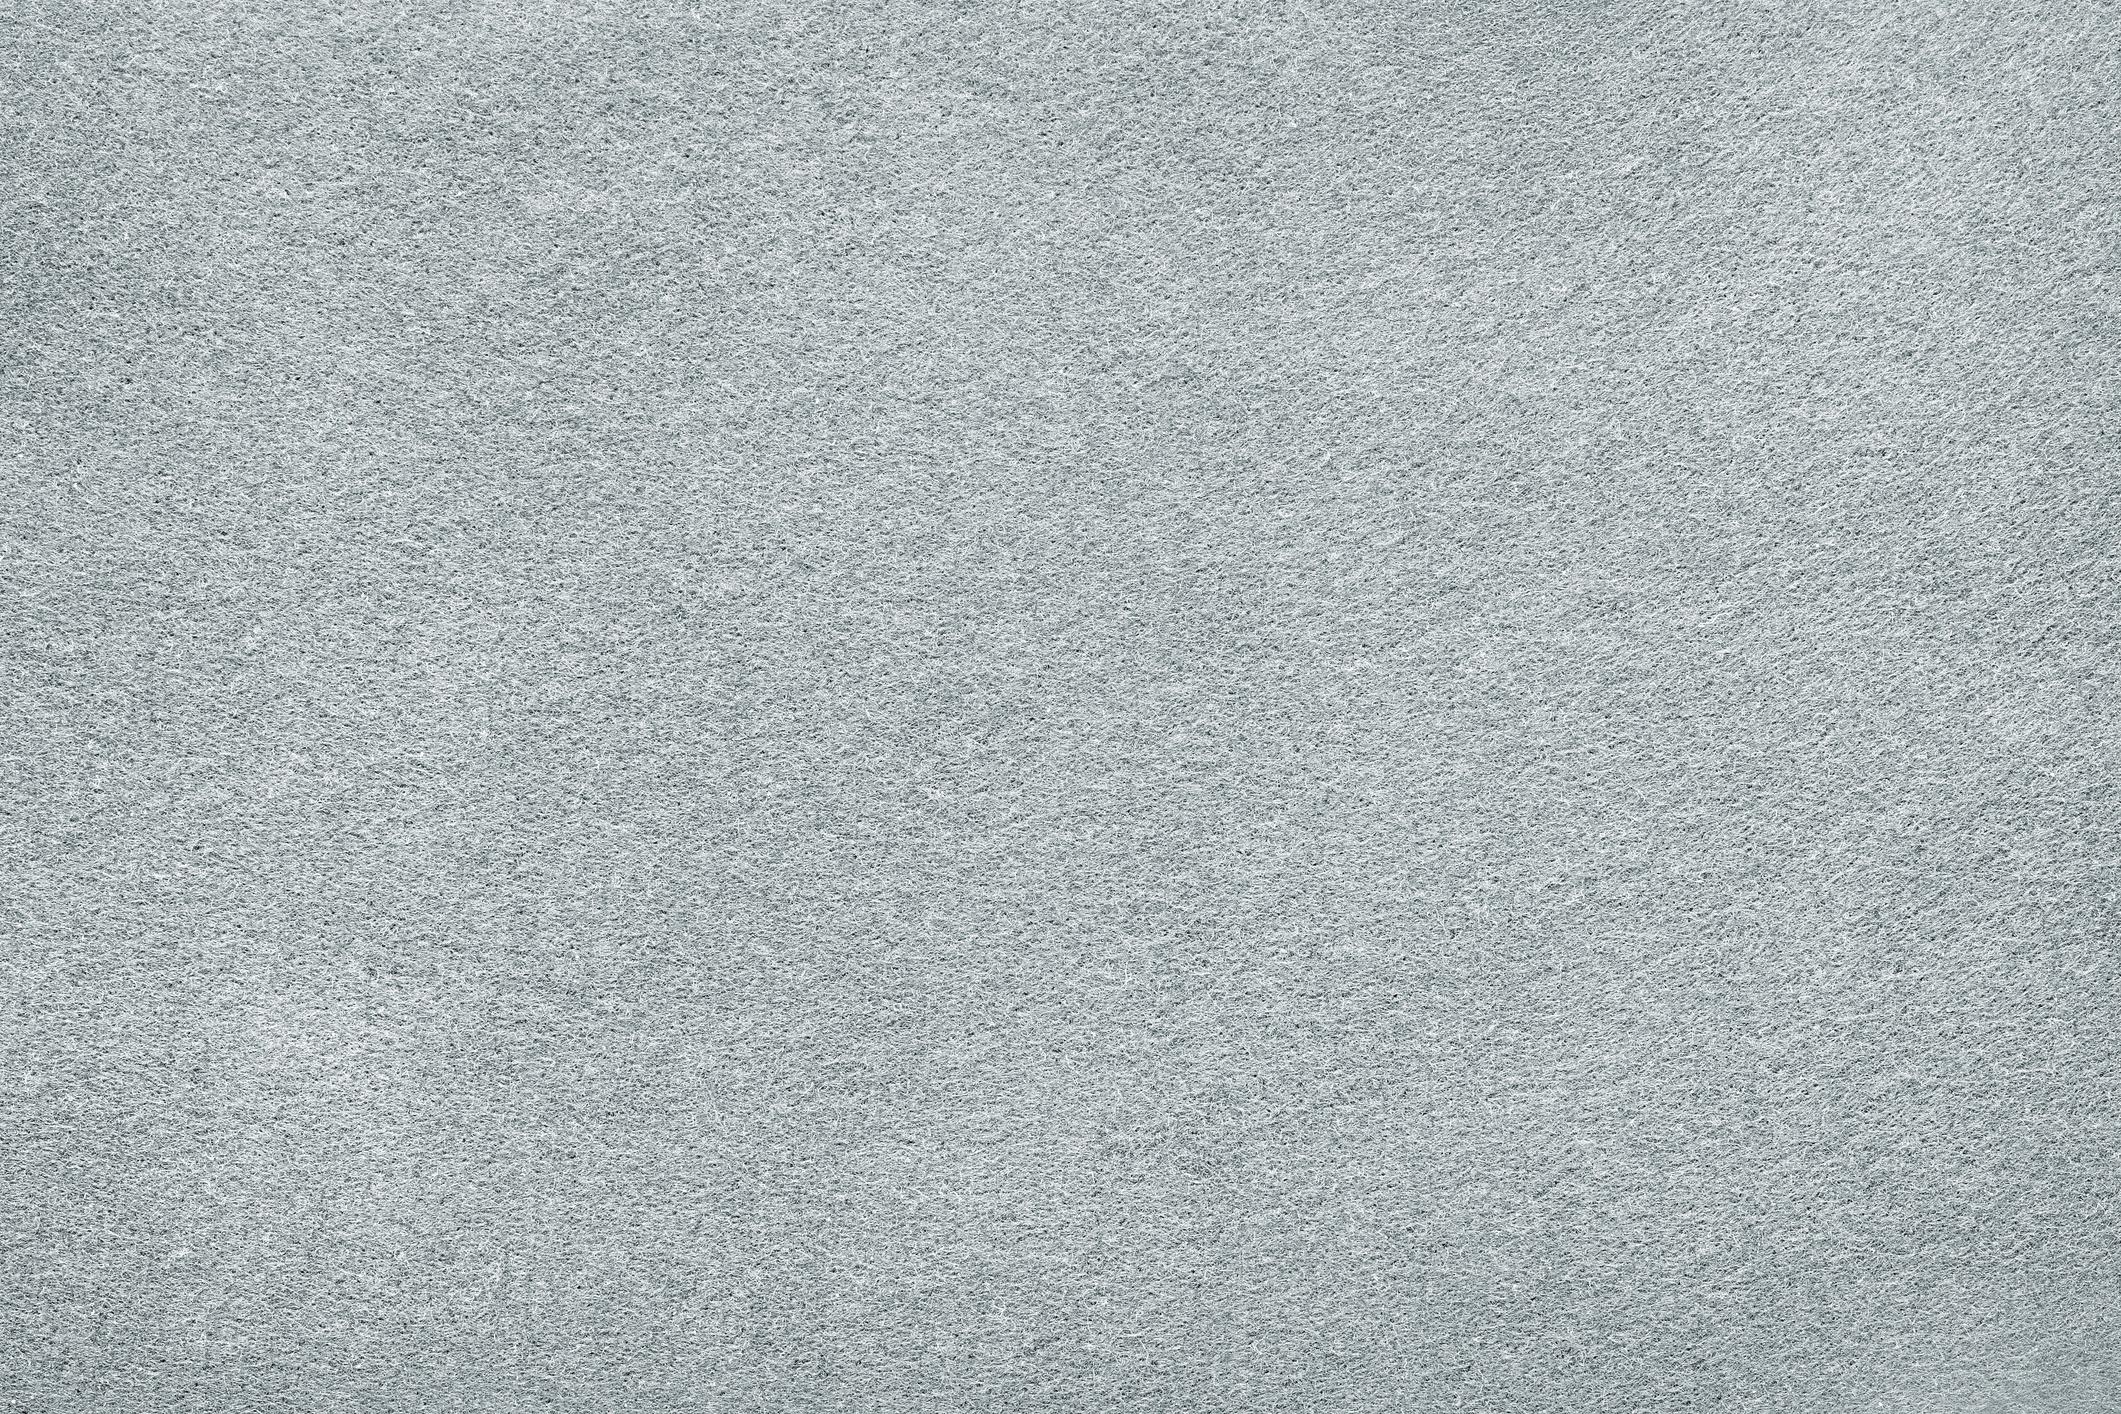 Our top tips for avoiding carpet lines zerorez indianapolis for Zerorez hardwood floors